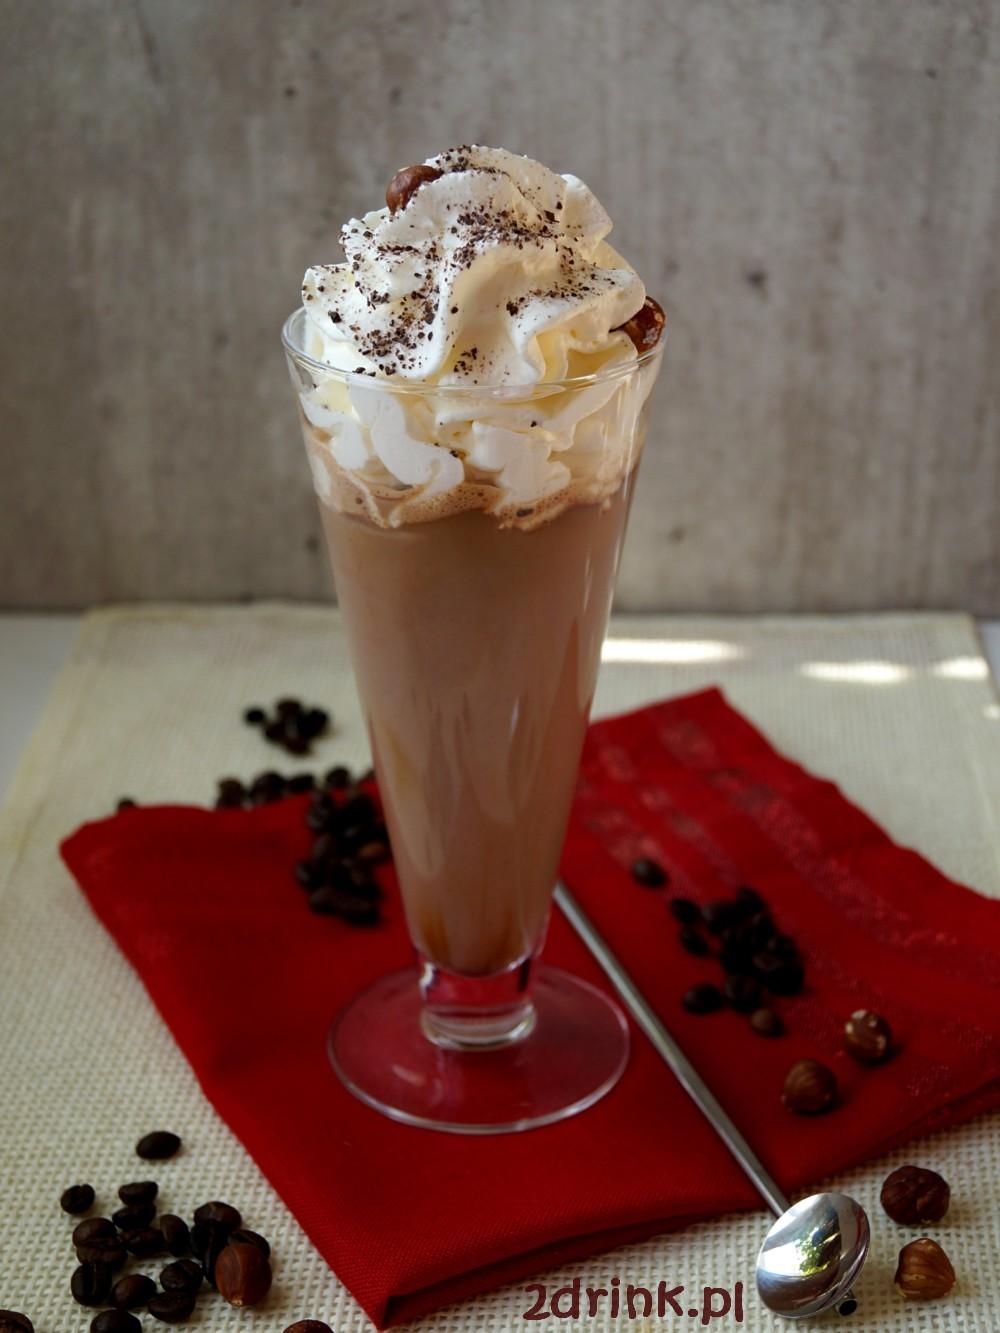 Nutella ice coffee